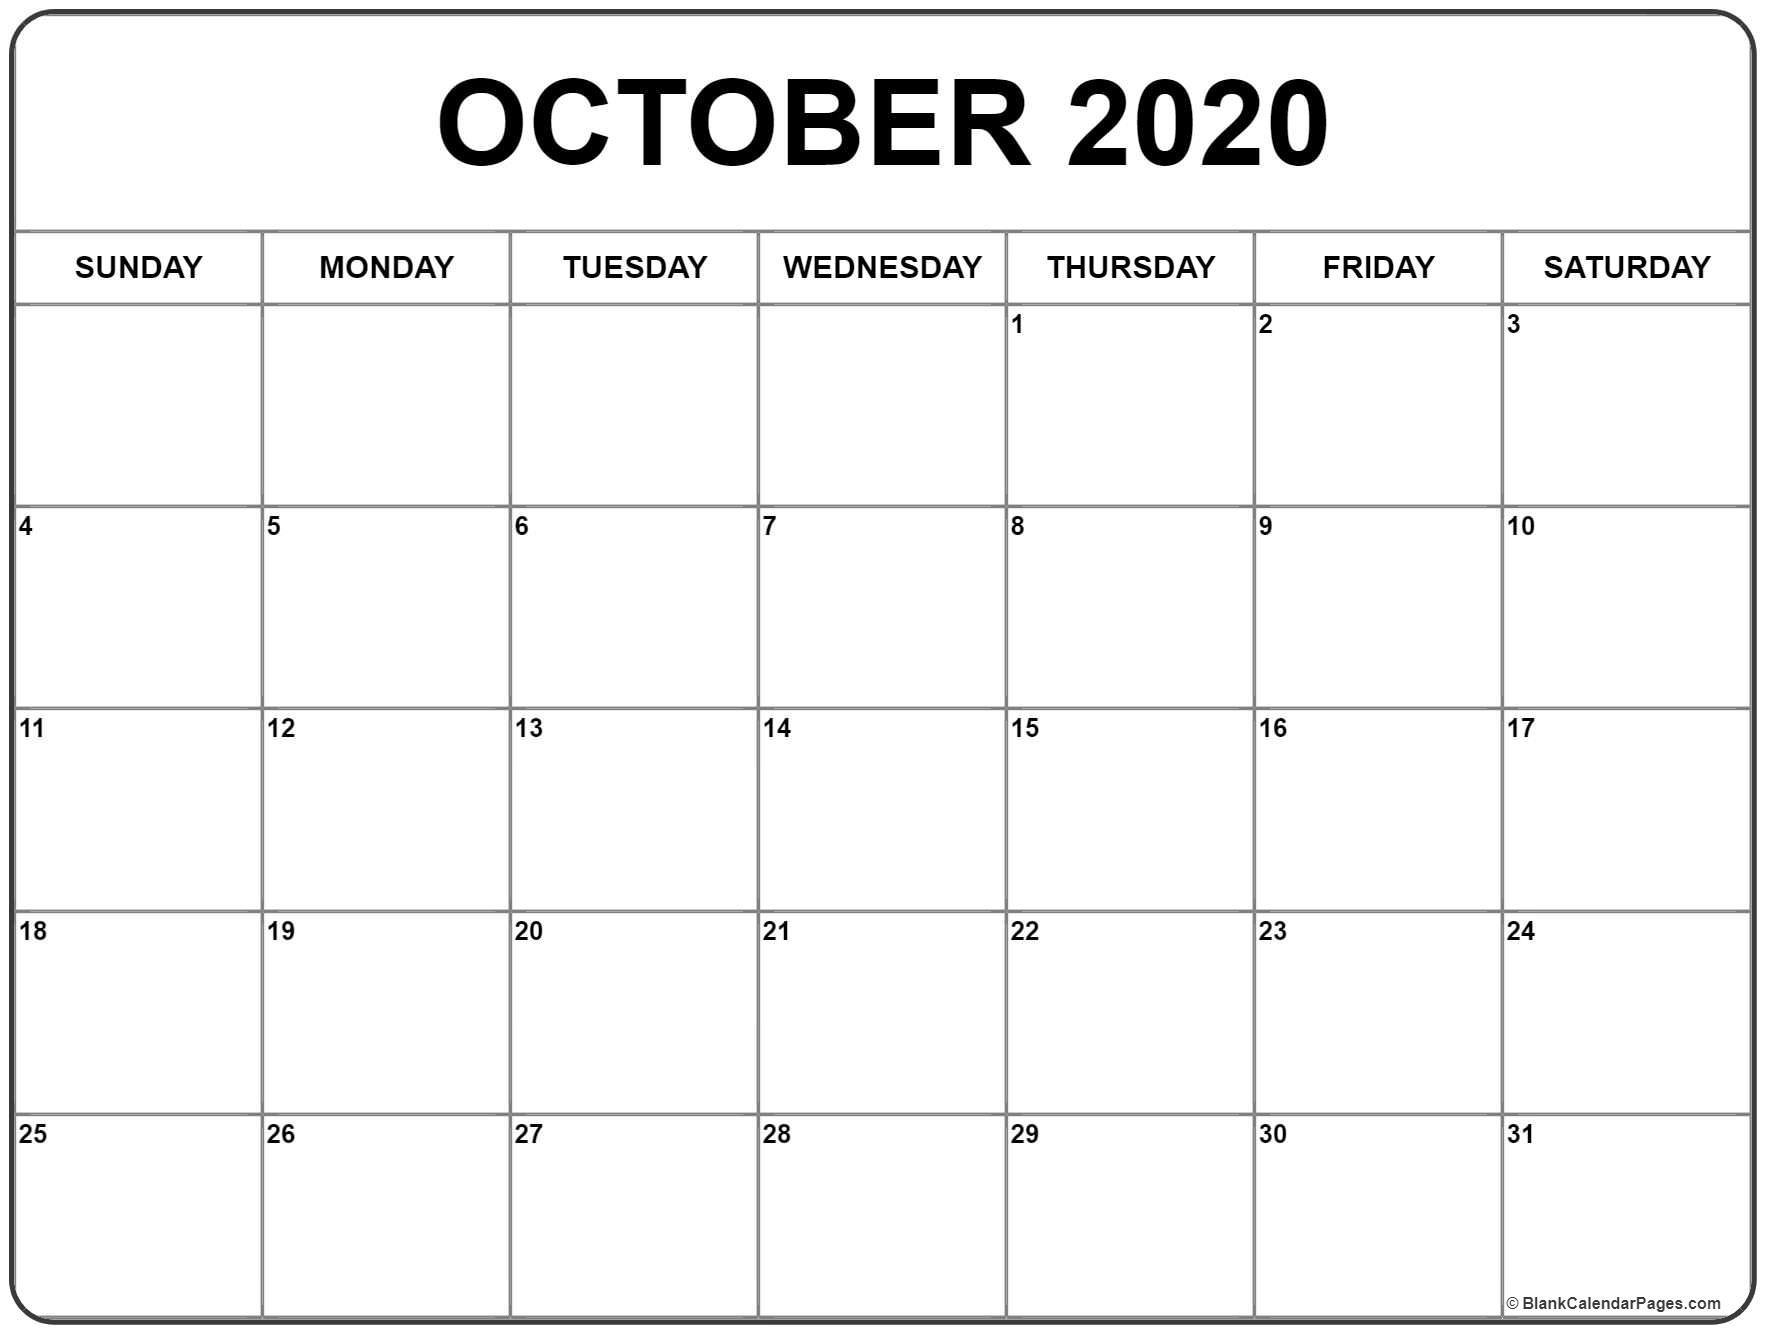 October 2020 Calendar | Thekpark-Hadong-Free Printable Blank October 2020 Calendar Jewish Holidays